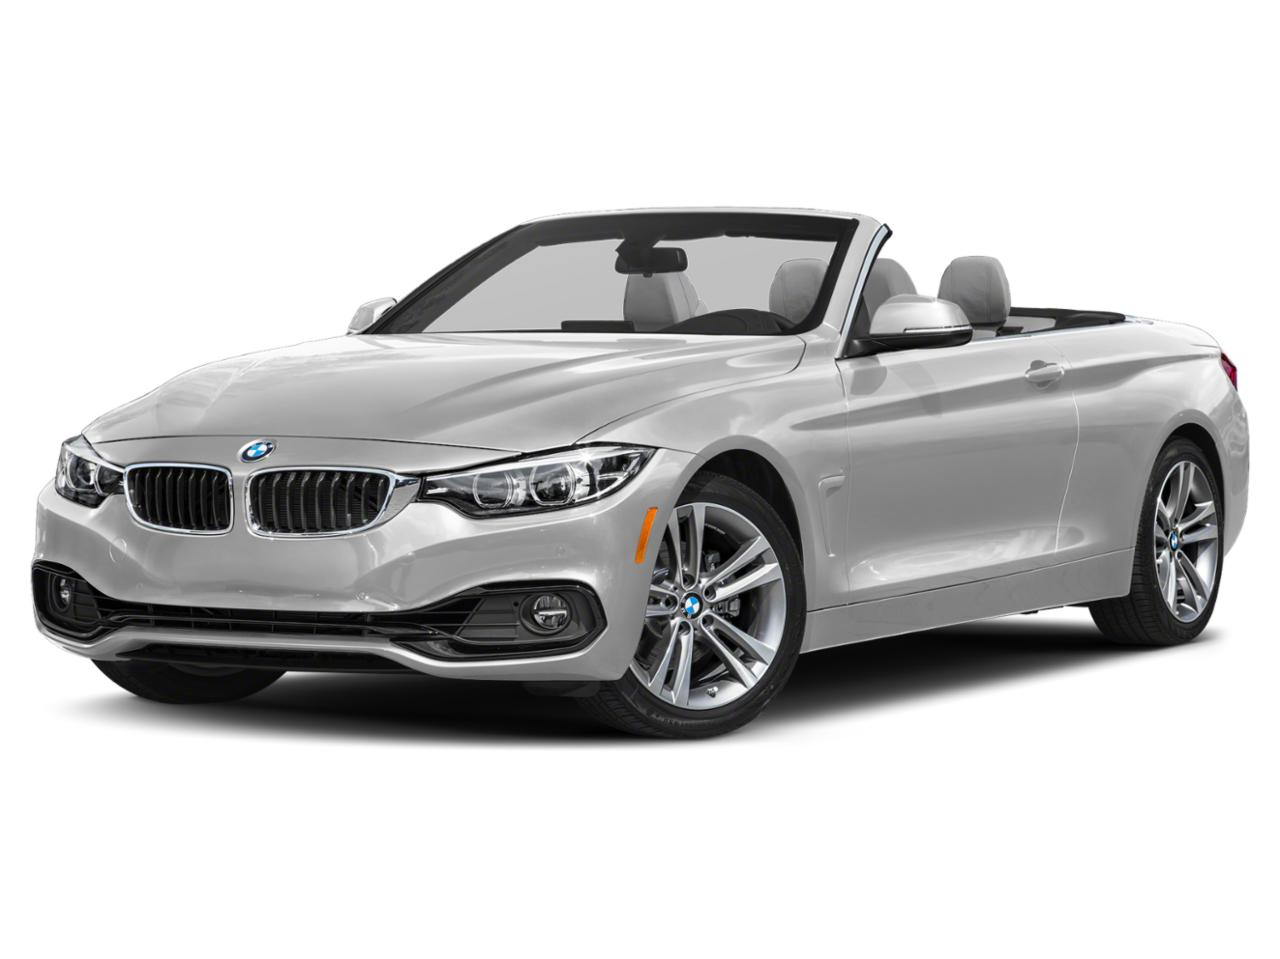 2018 BMW 430i Vehicle Photo in Pleasanton, CA 94588